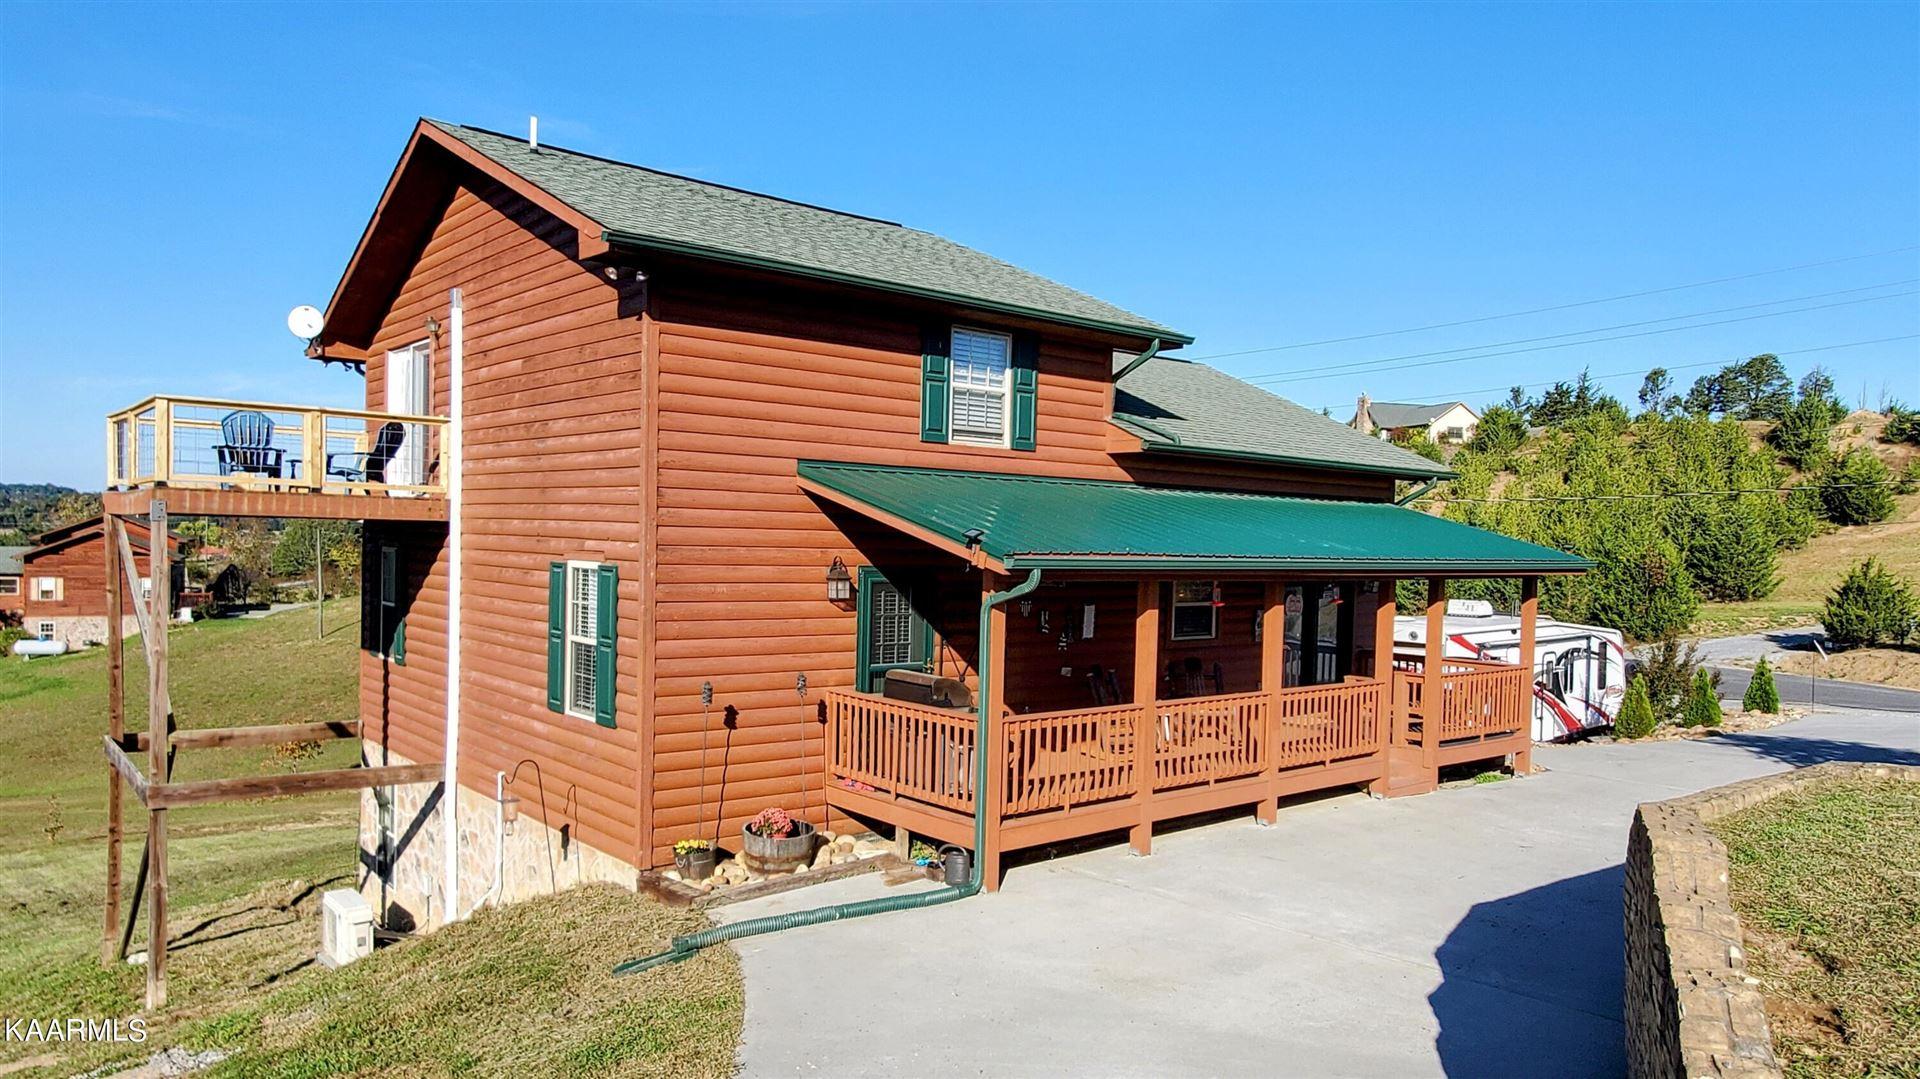 Photo of 1339 Parrotts Chapel Rd, Sevierville, TN 37876 (MLS # 1171495)